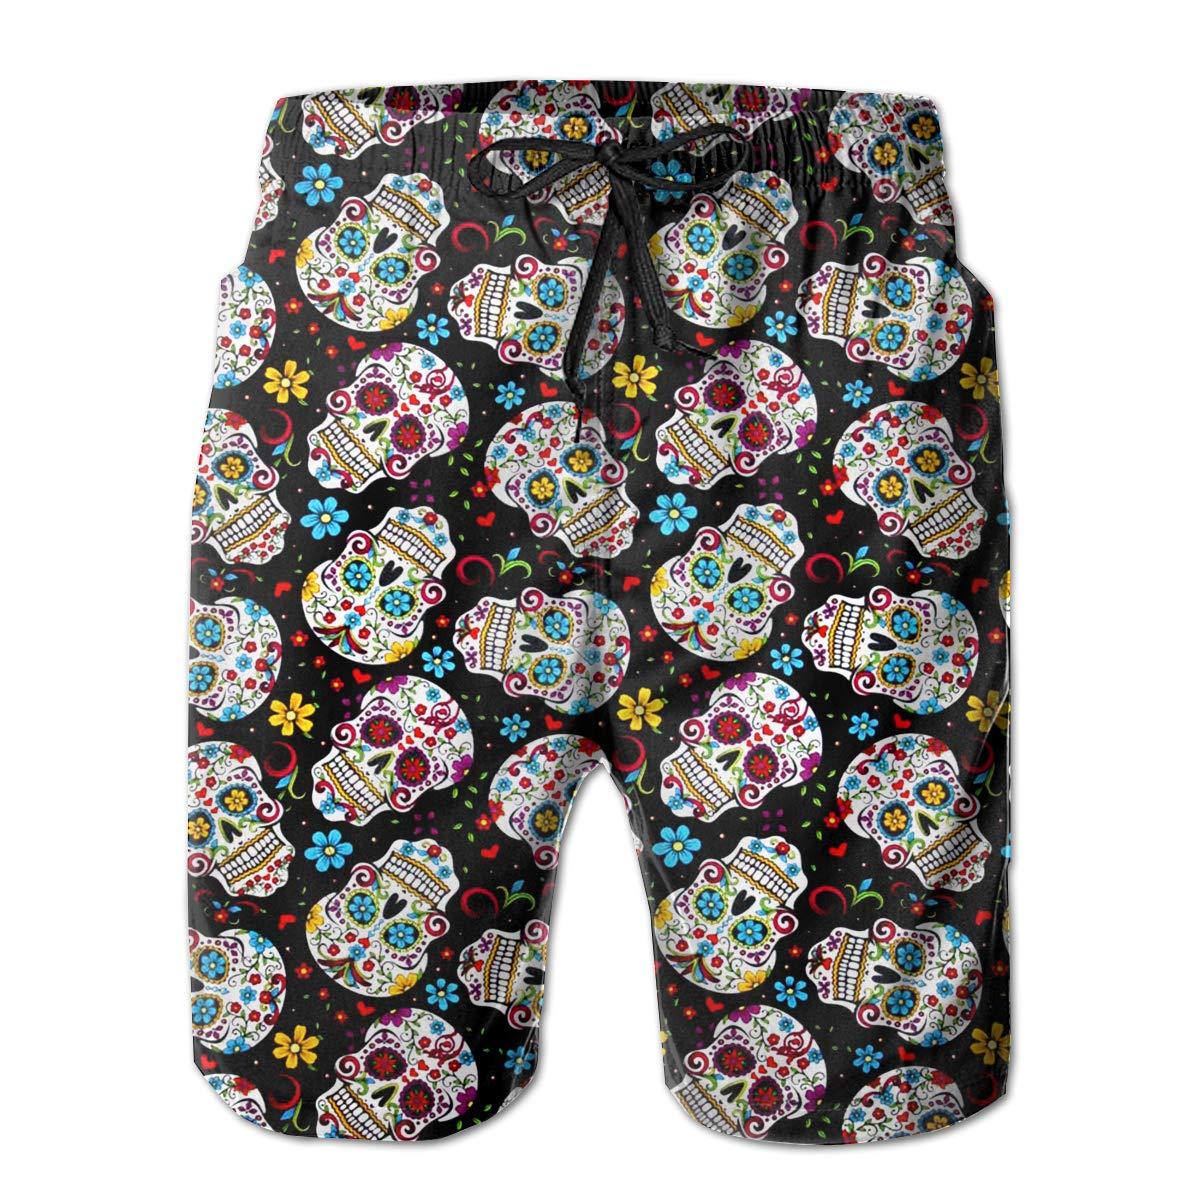 Sugar Skulls Boardshorts Mens Swimtrunks Fashion Beach Shorts Casual Shorts Swim Trunks